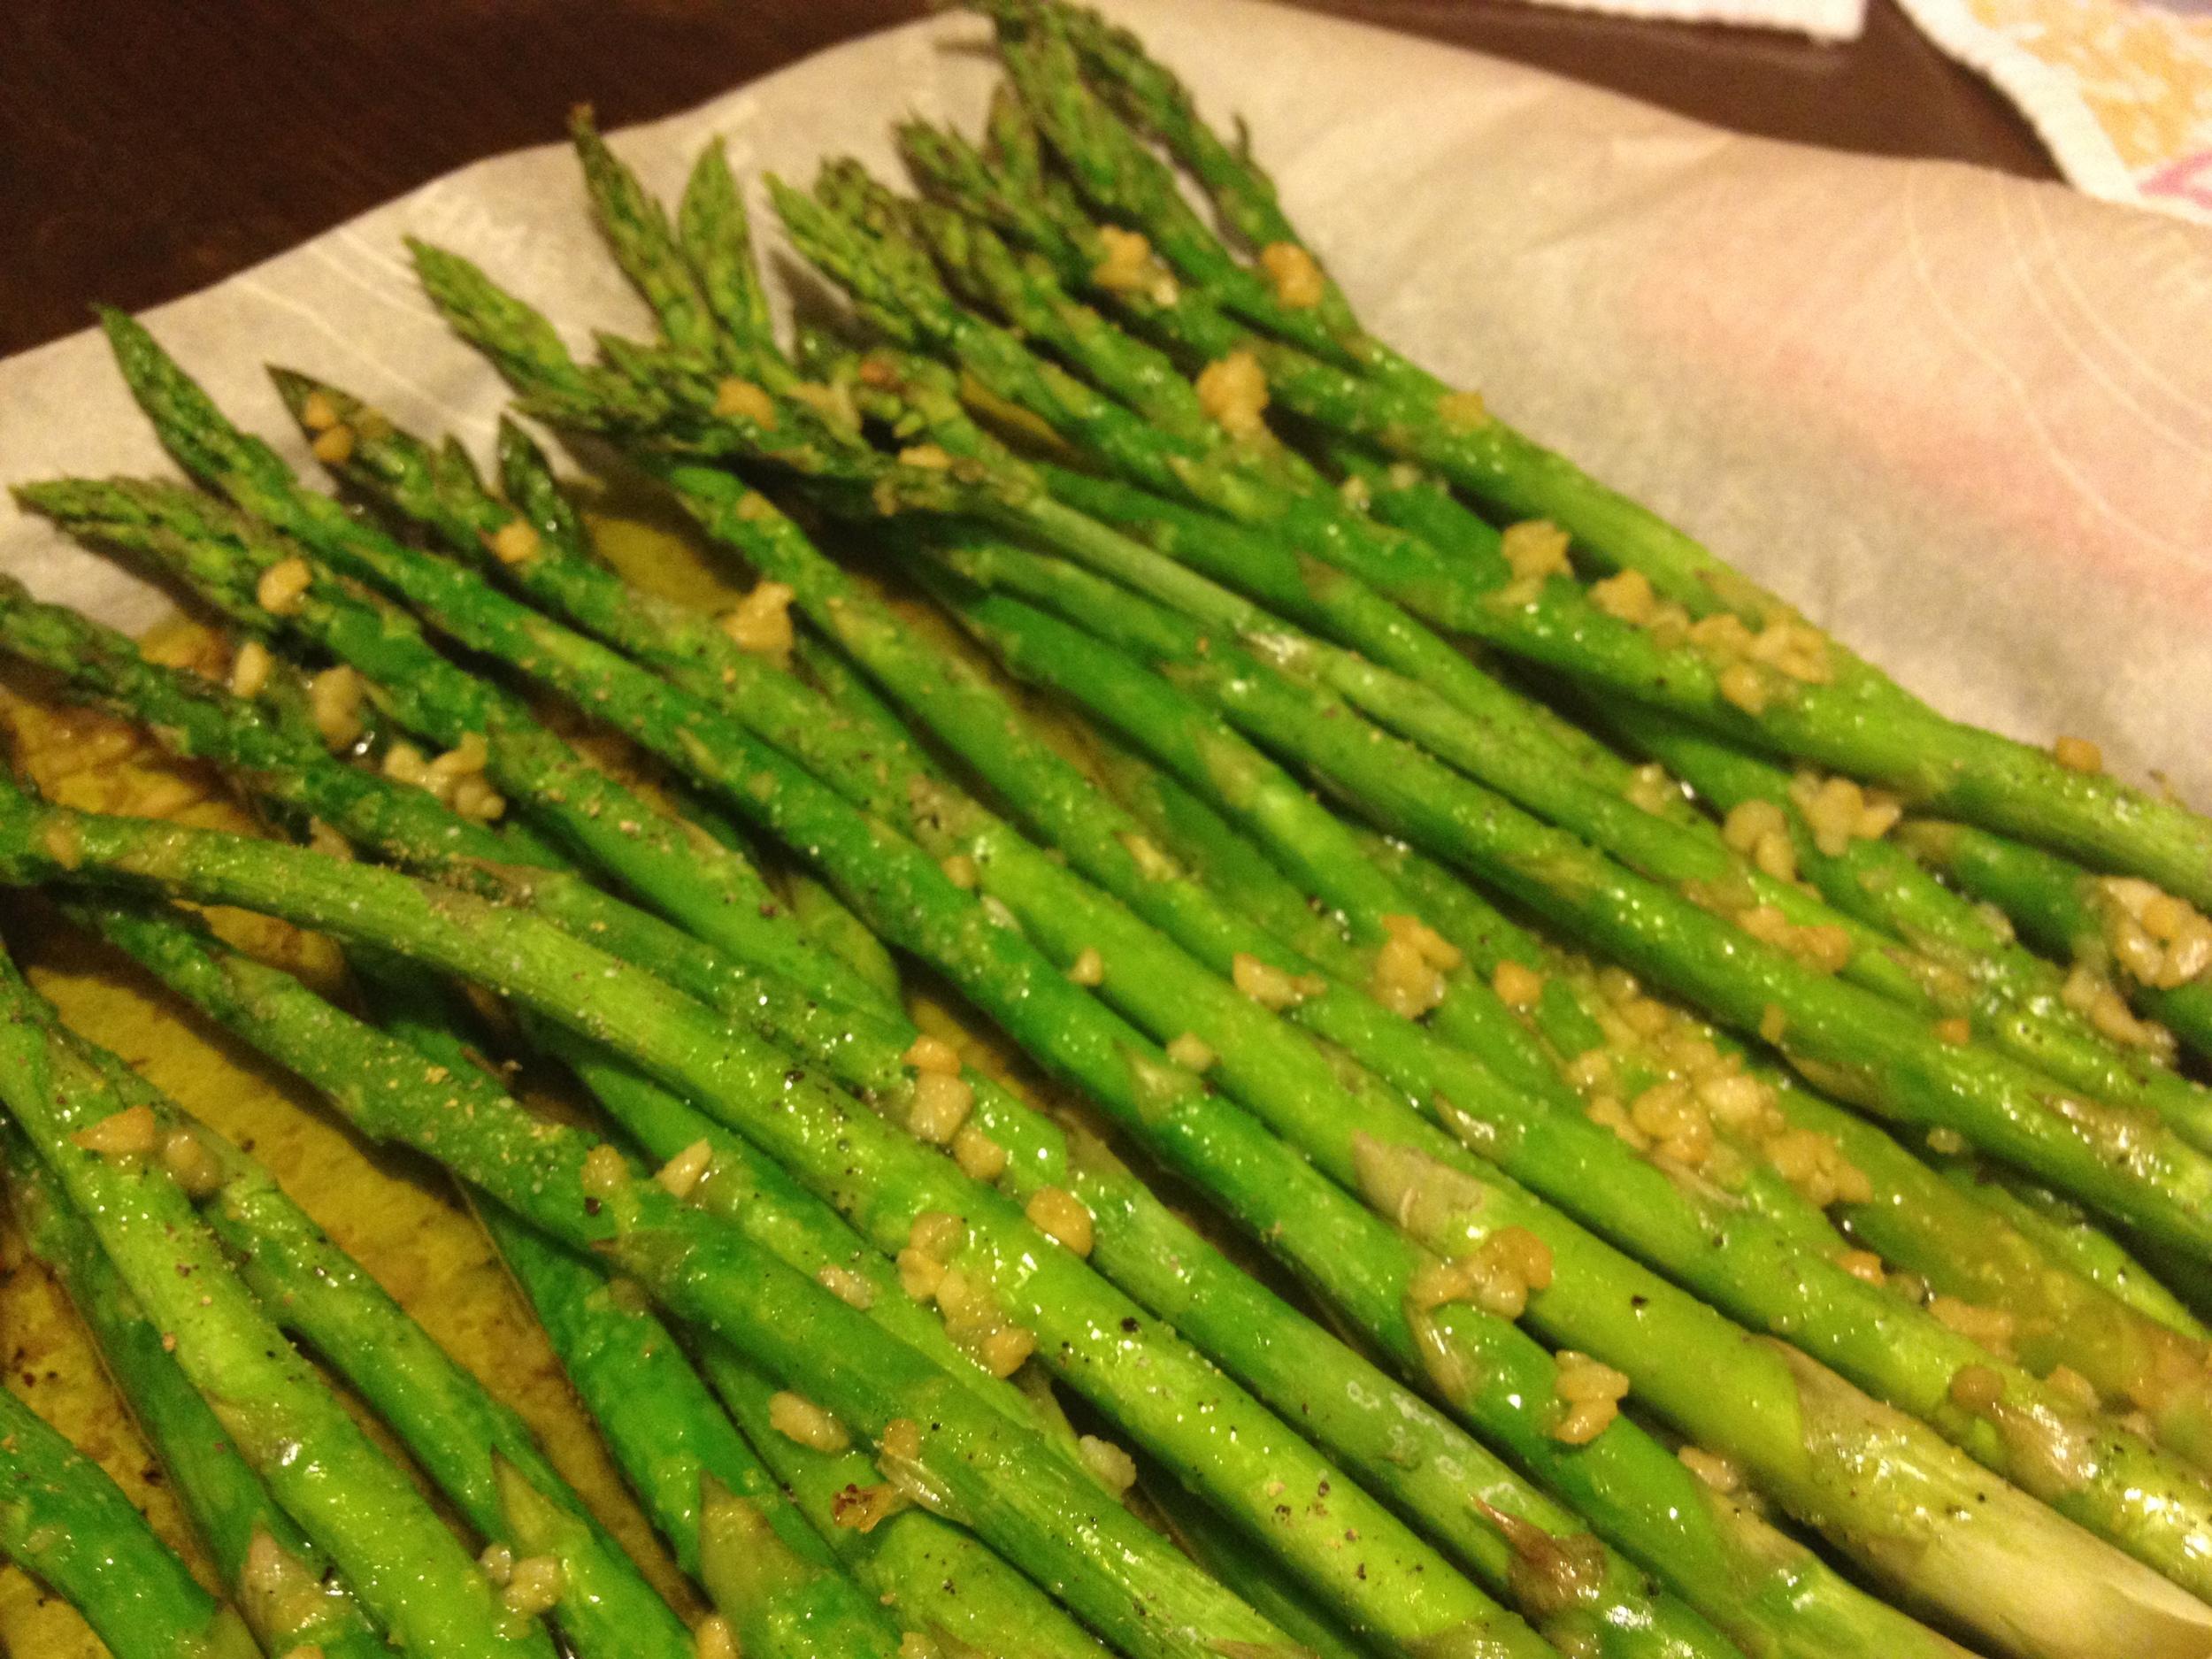 Roasted-Garlic Asparagus